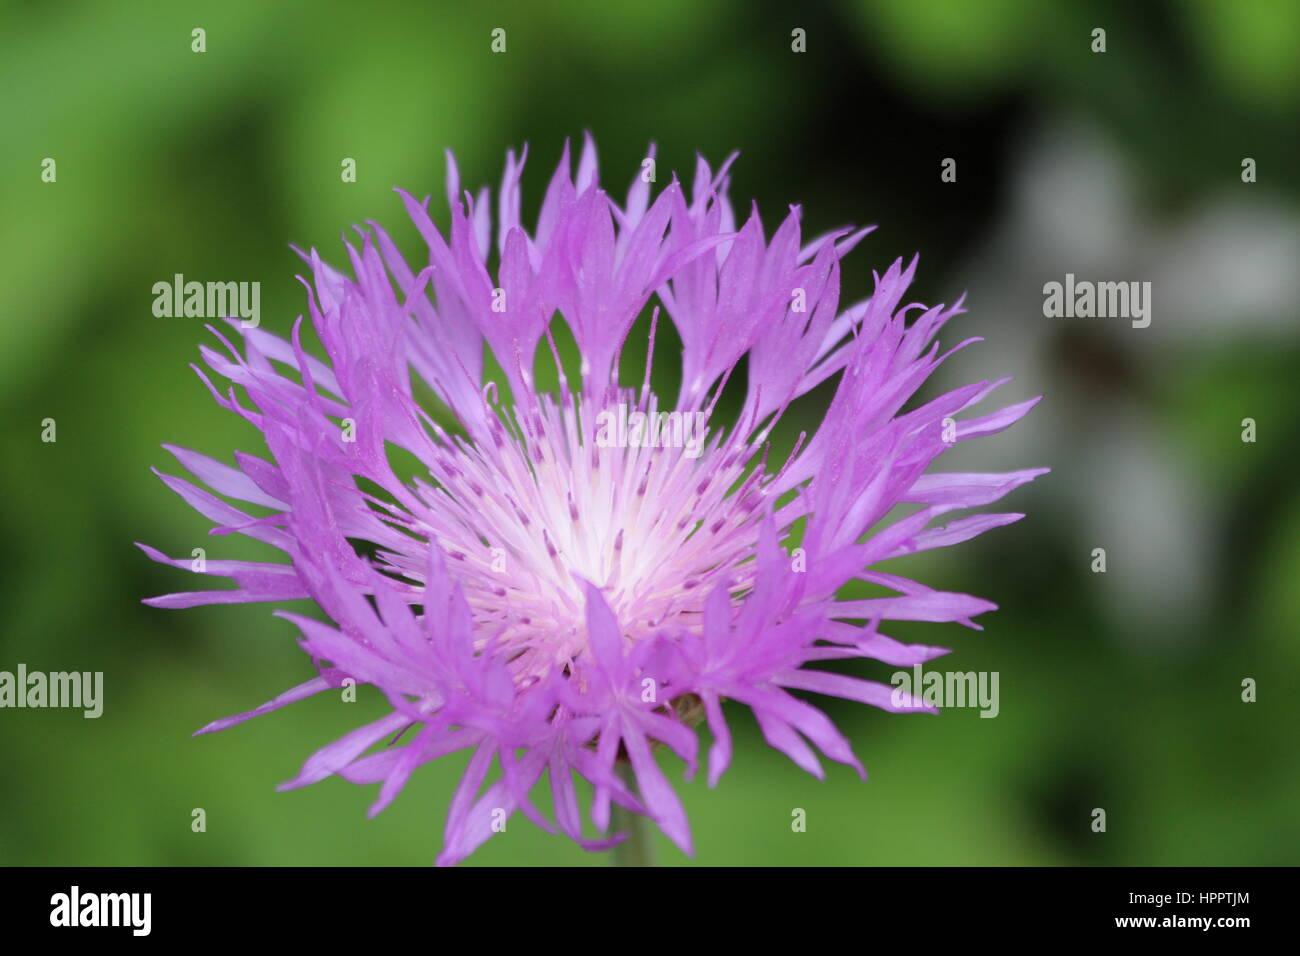 Spiky Flower Bud Stock Photos Spiky Flower Bud Stock Images Alamy